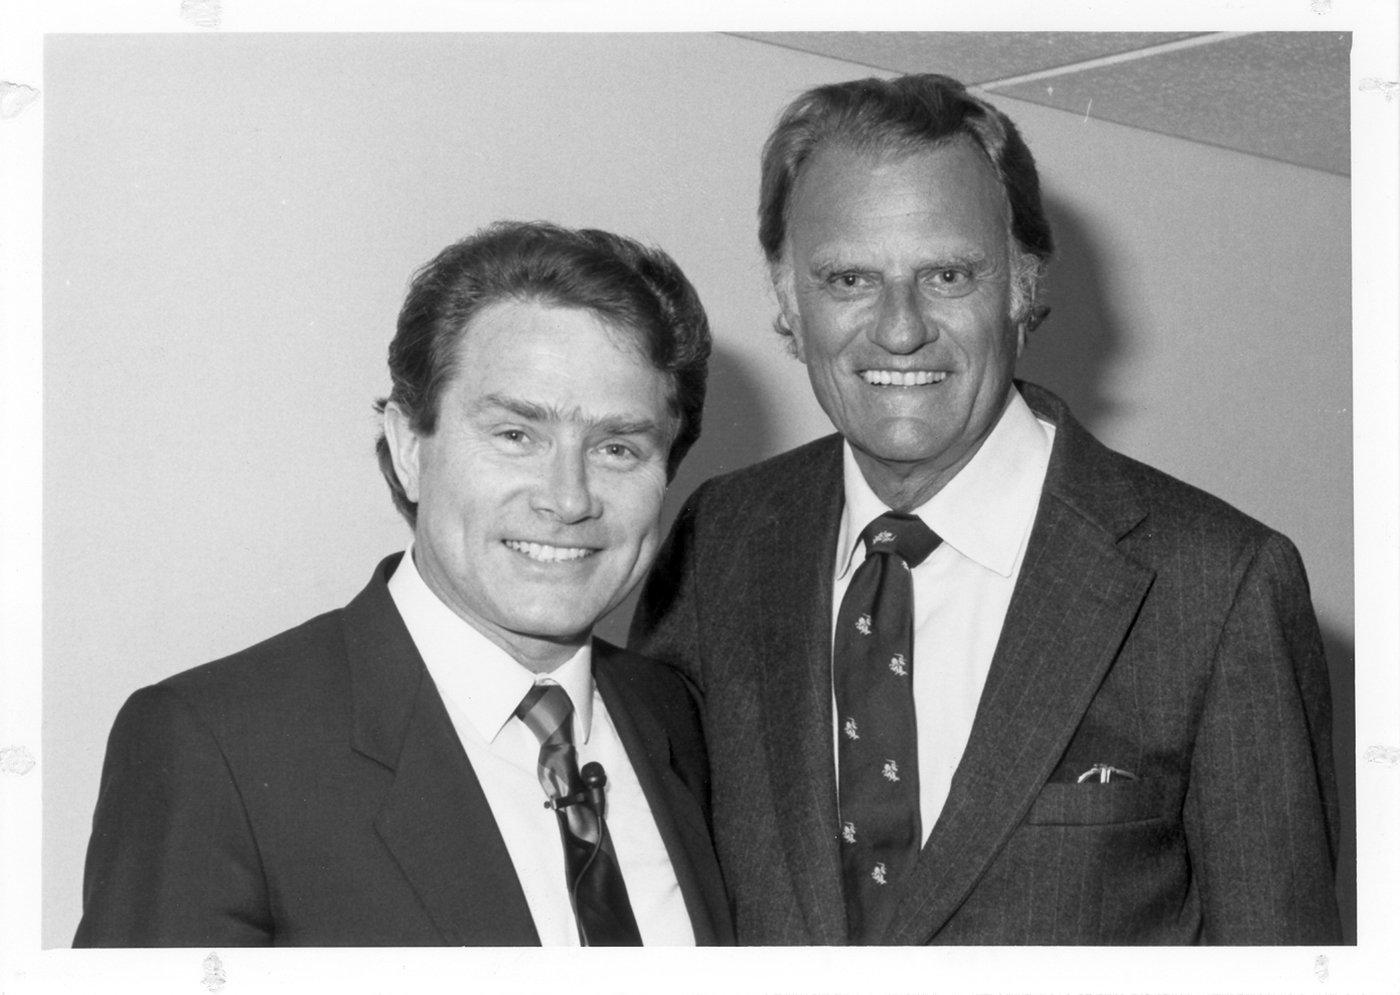 Luis Palau and Billy Graham. Photo courtesy of the Luis Palau Association